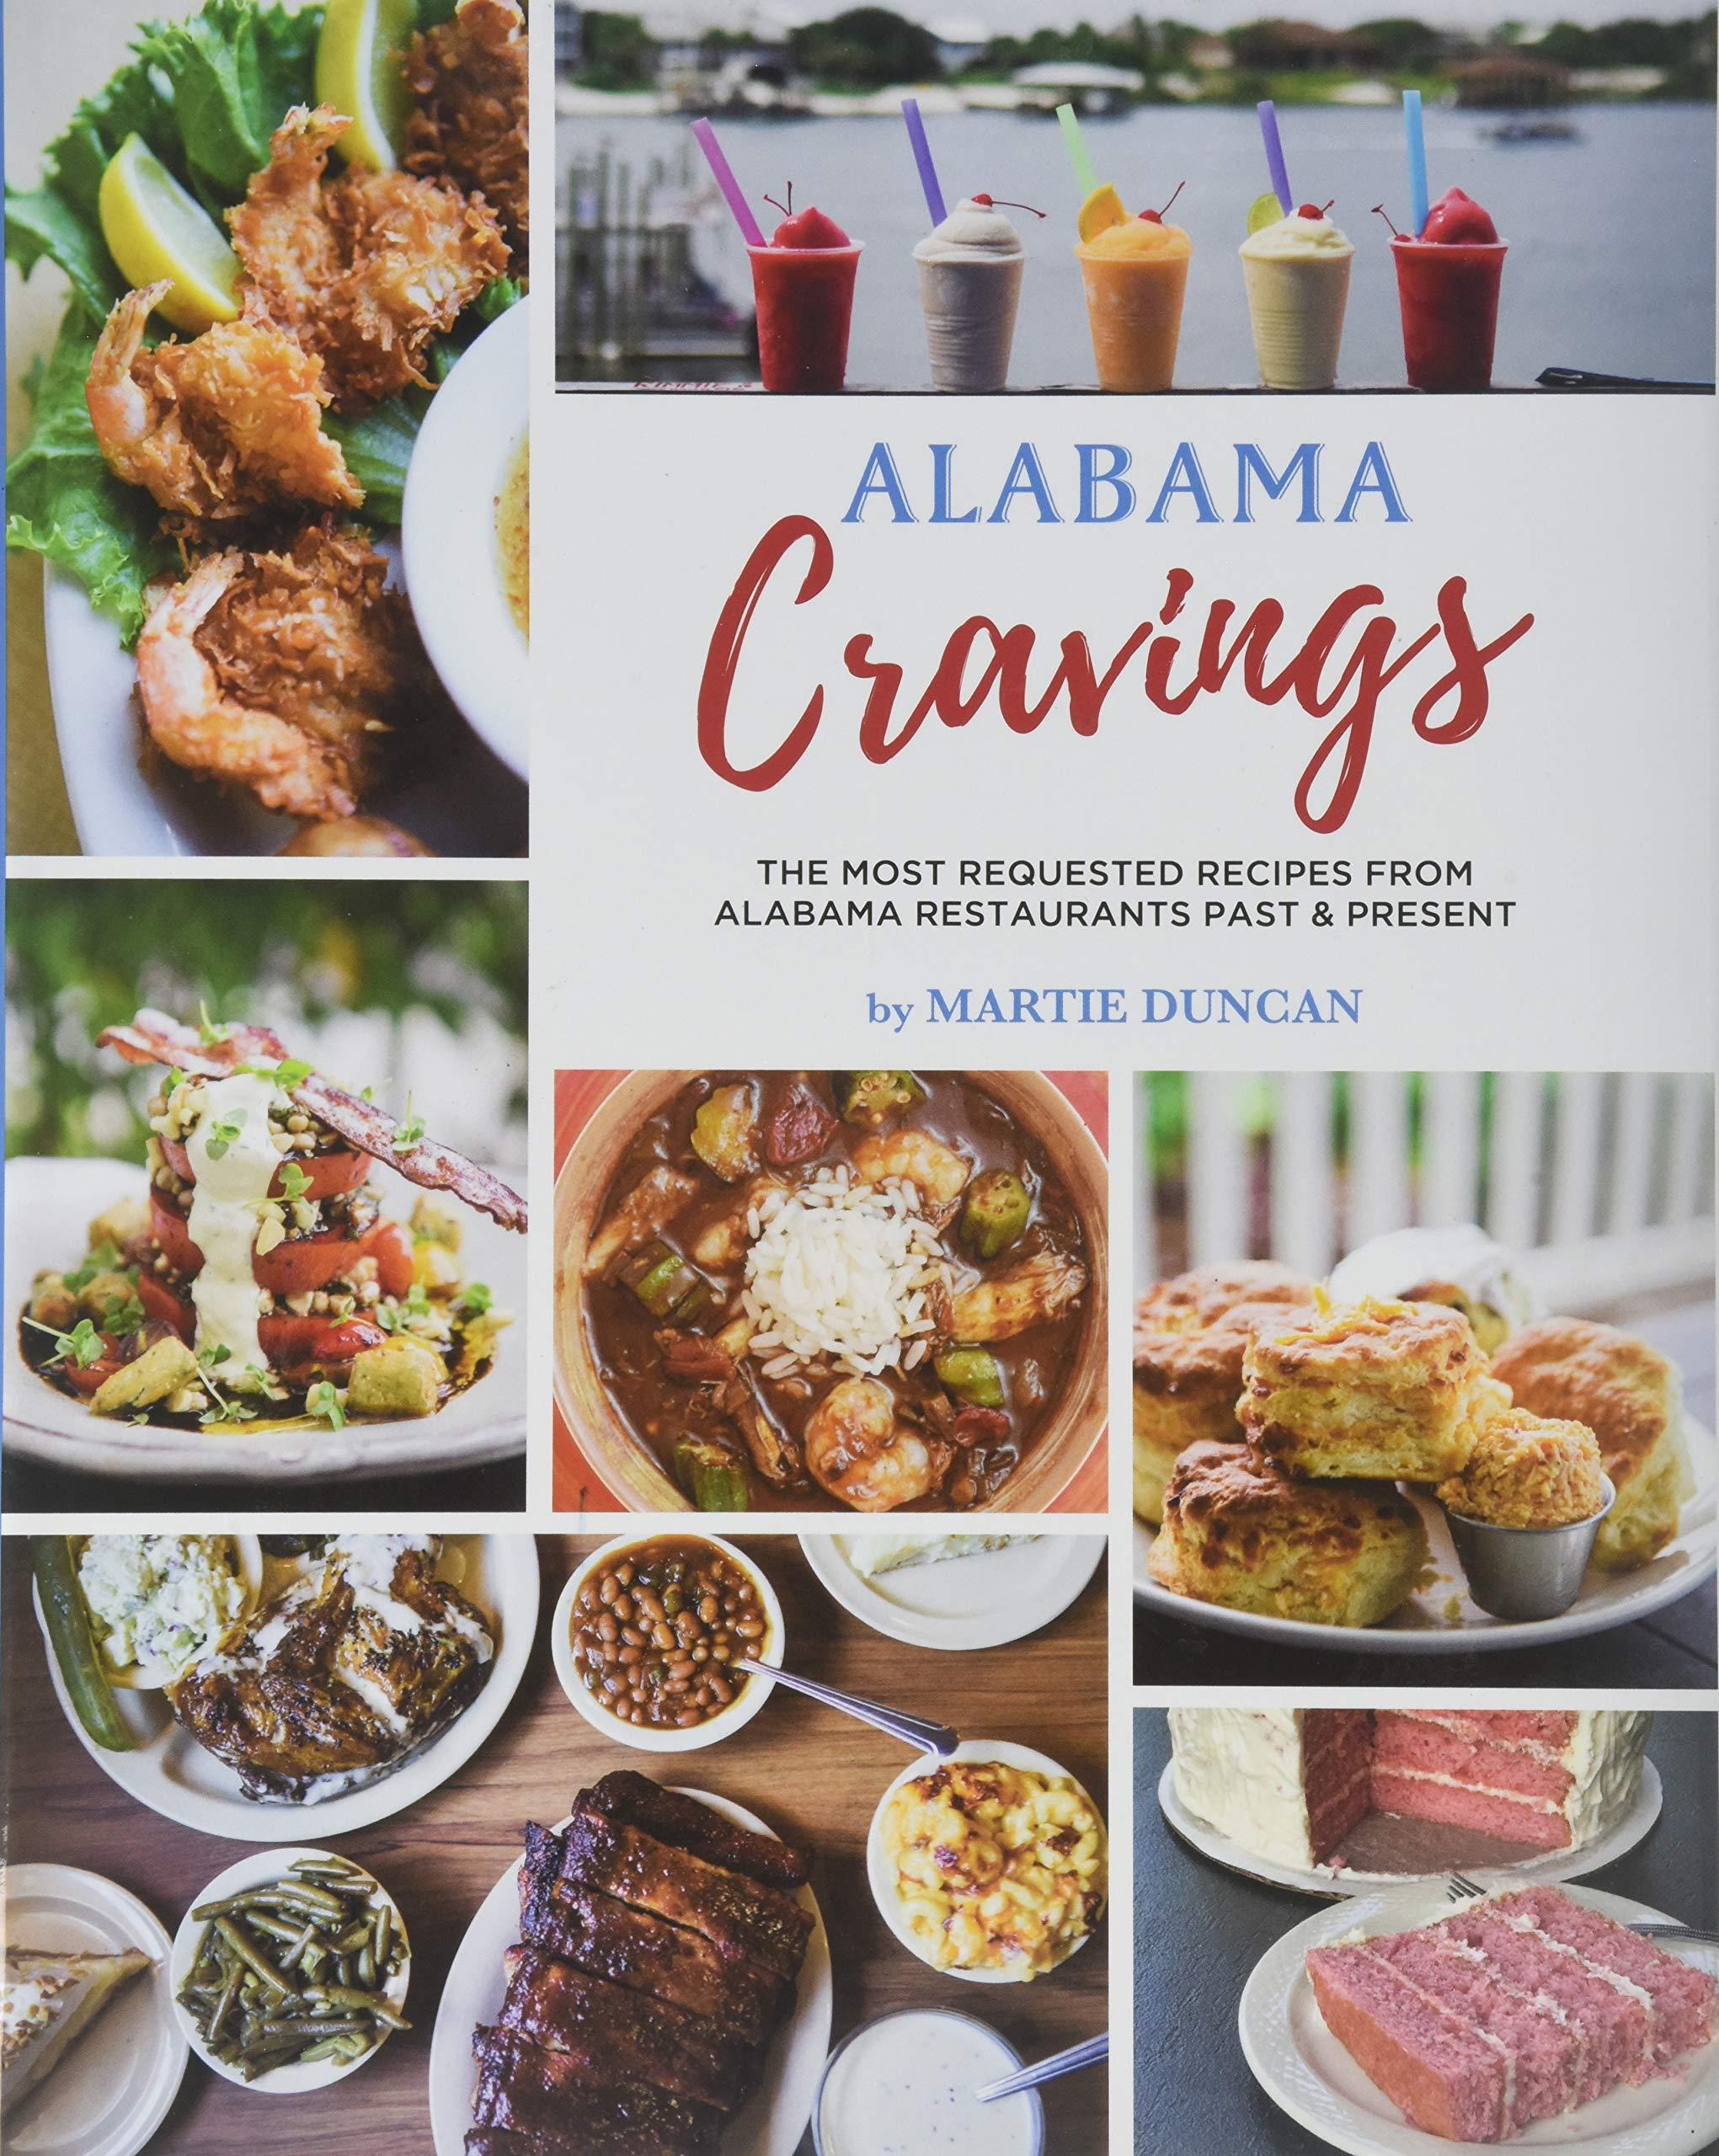 Astounding Alabama Cravings The Most Requested Alabama Restaurant Download Free Architecture Designs Licukmadebymaigaardcom